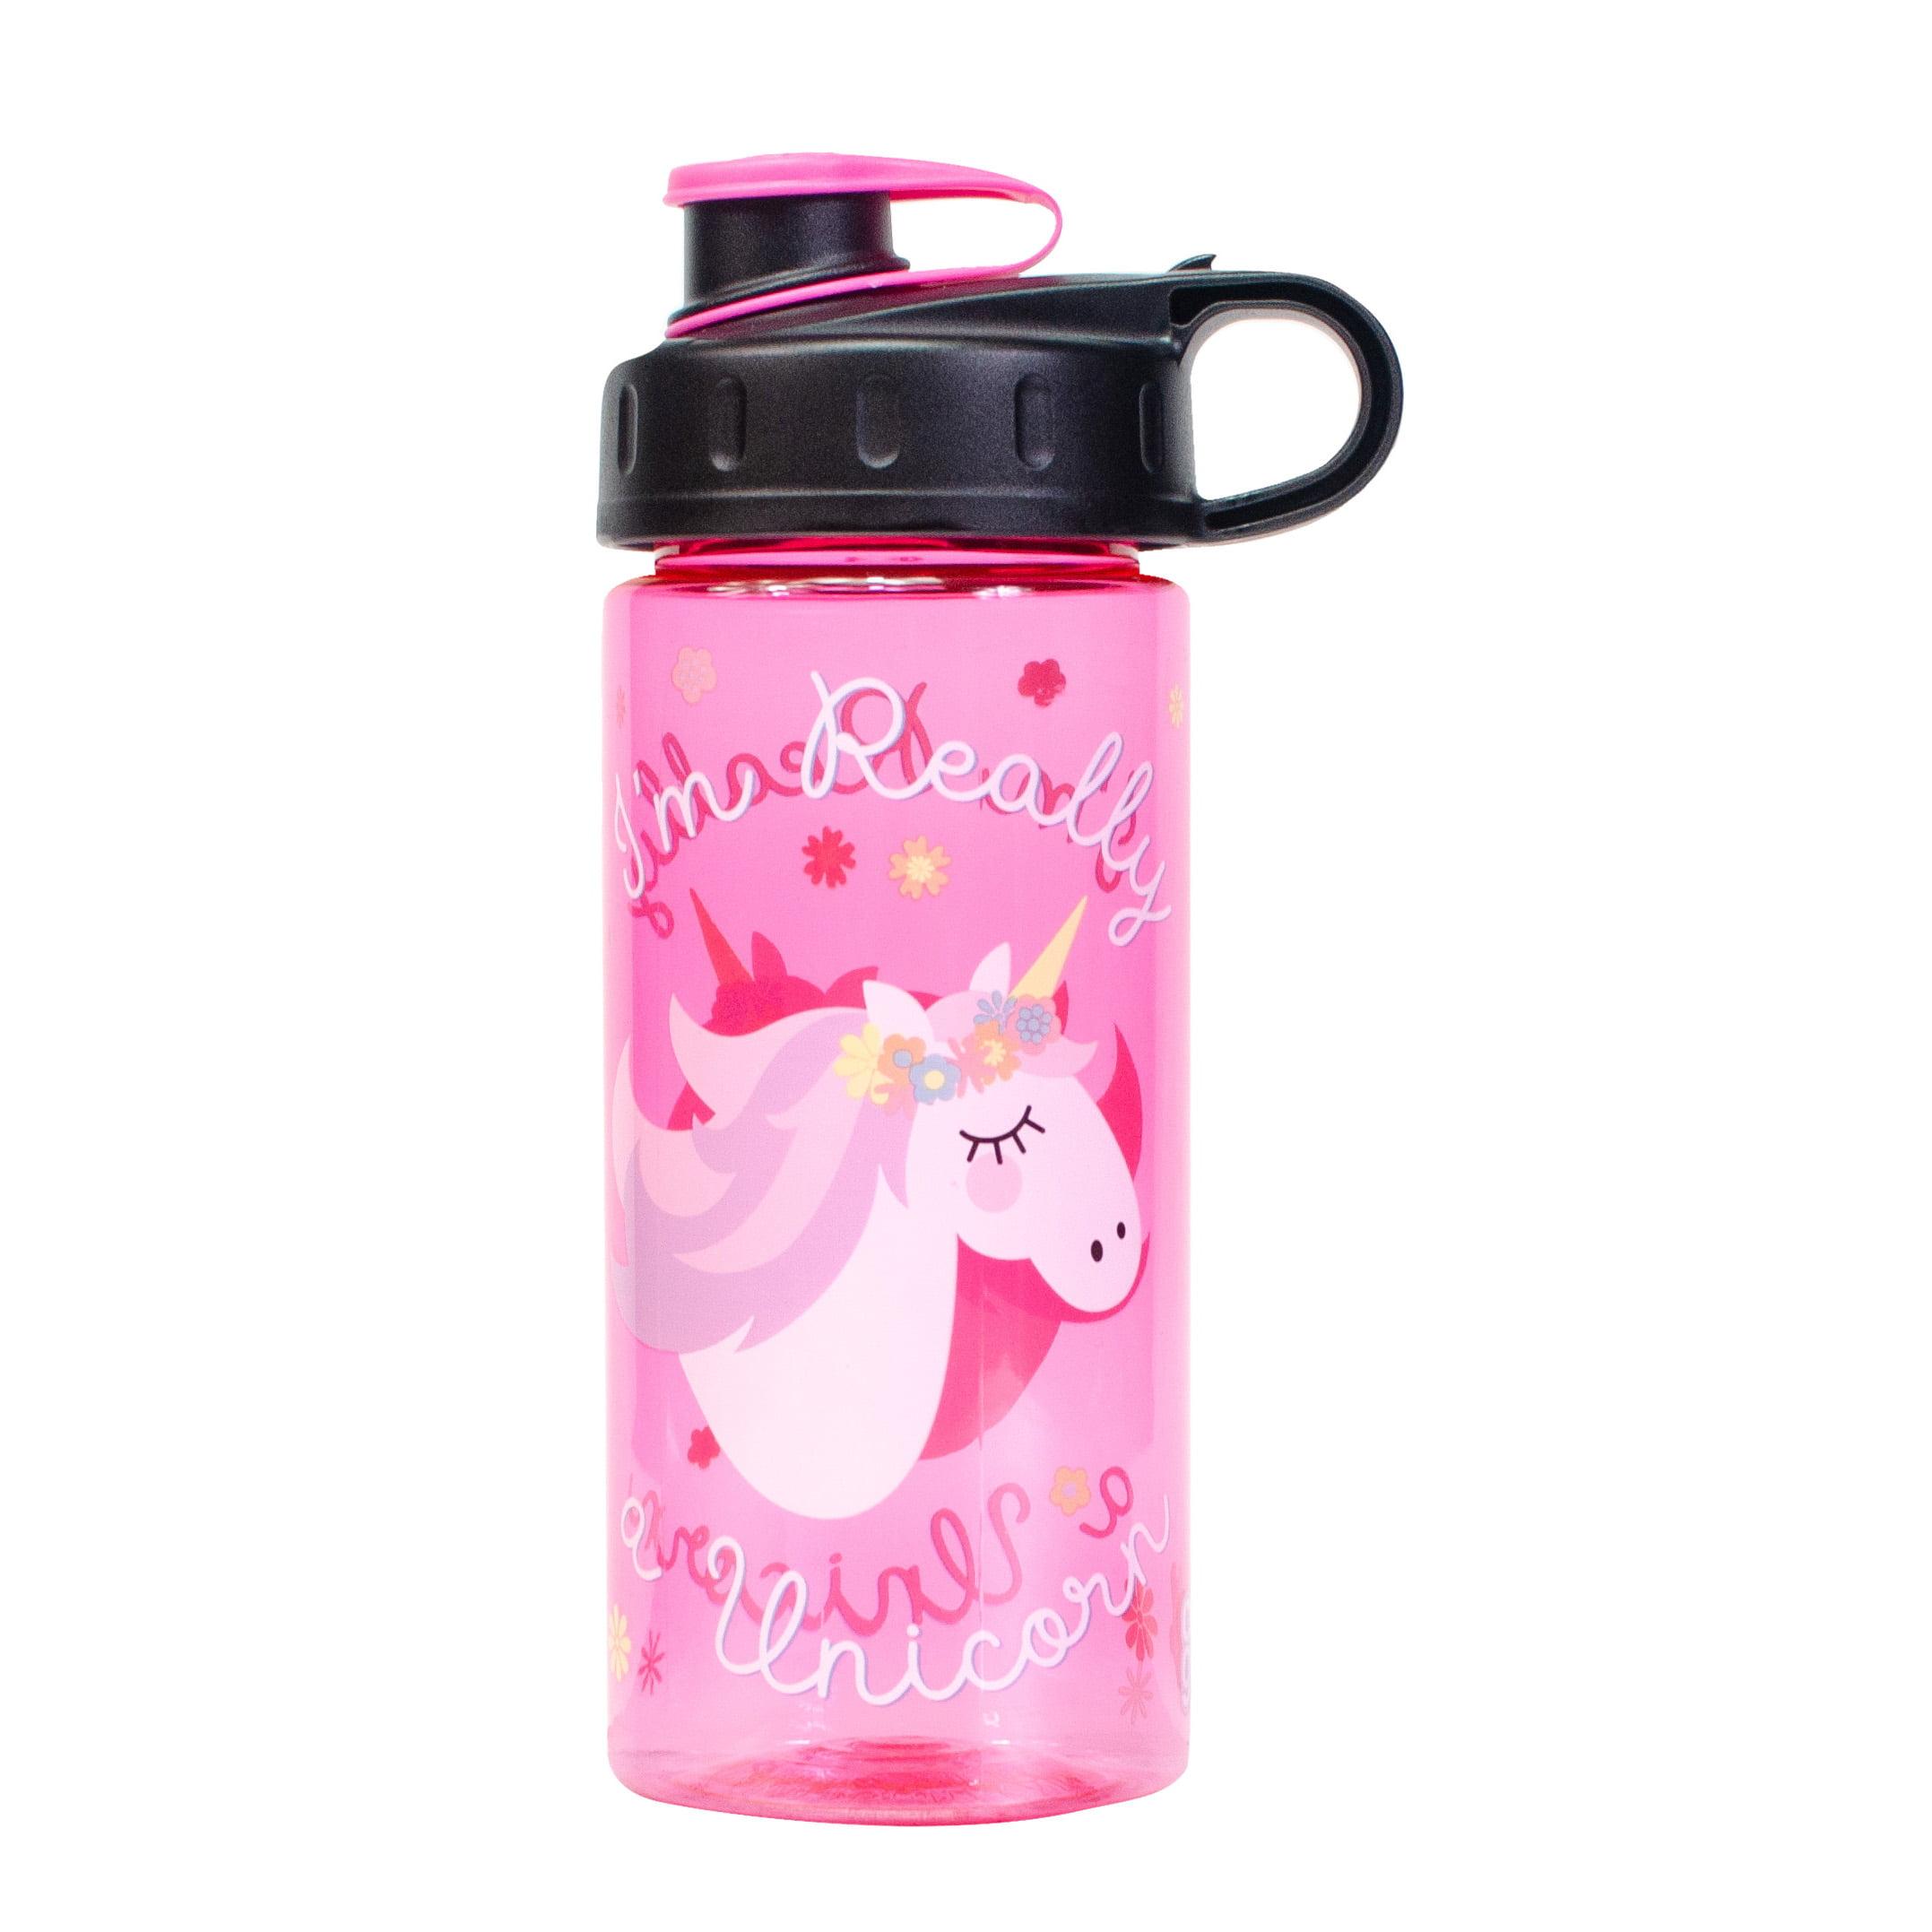 Cool Gear Im Really a Unicorn Pink Girls Plastic Water Bottle 16 oz BPA FREE